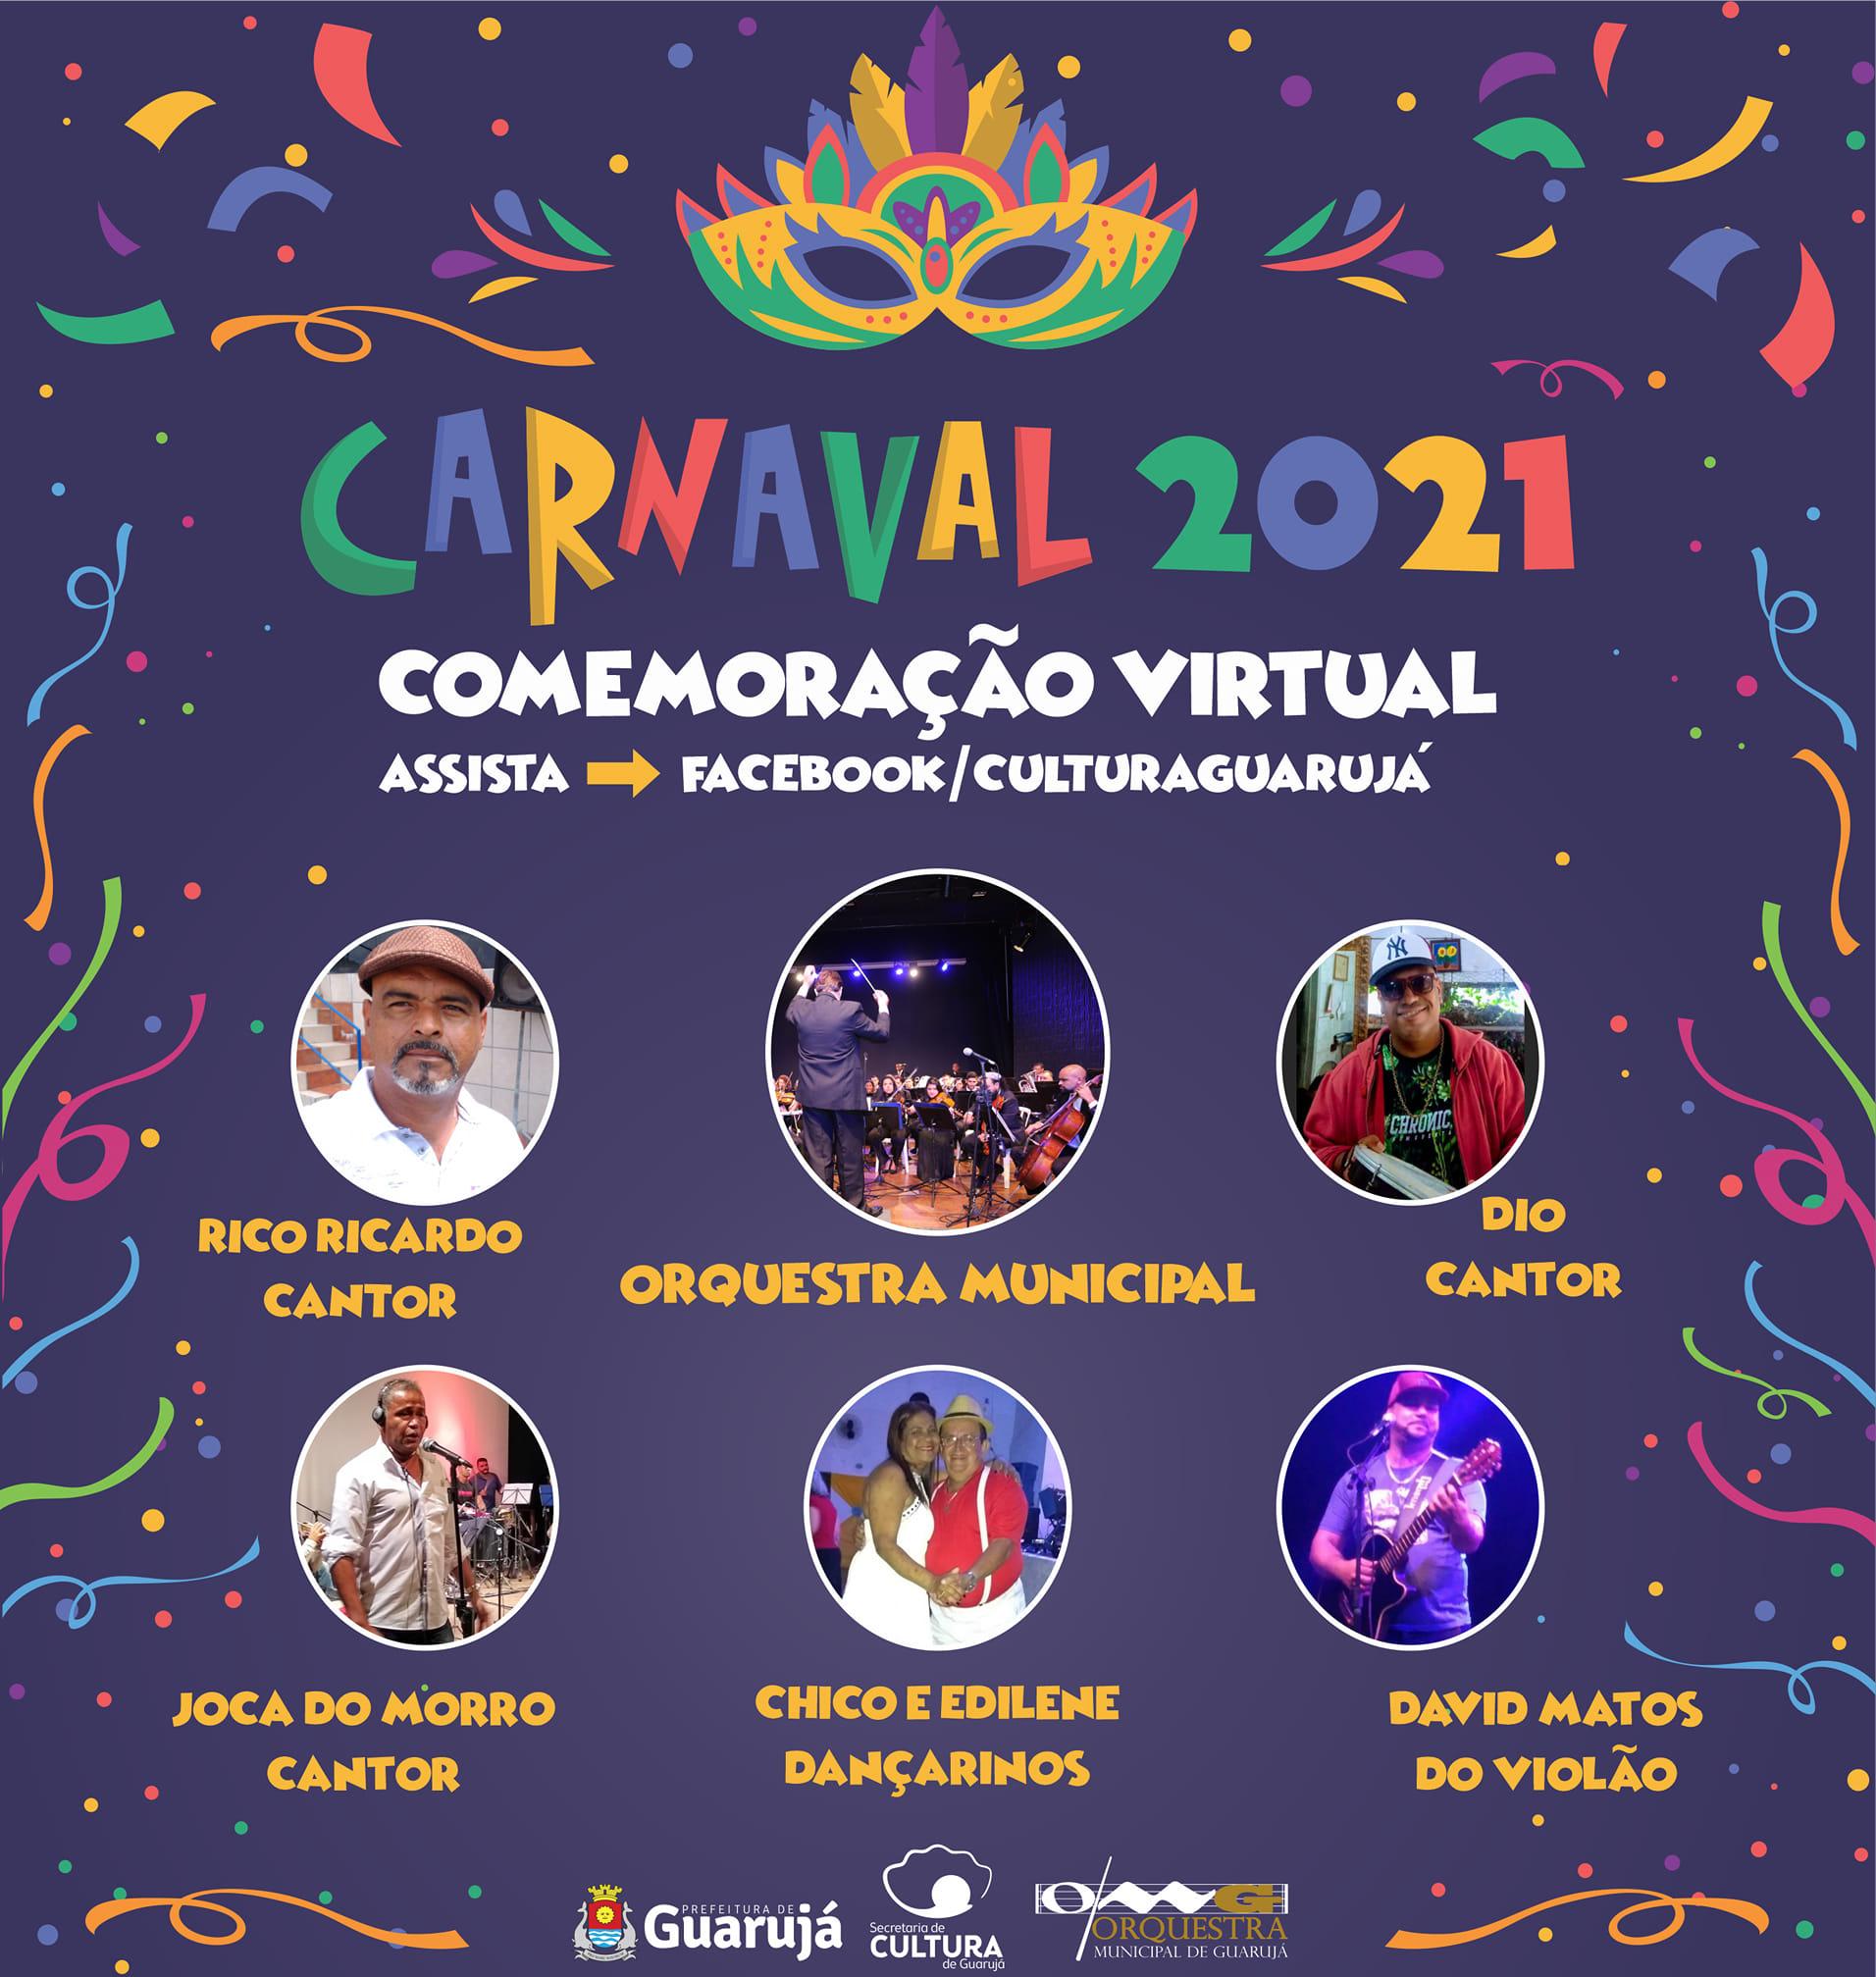 Orquestra Municipal apresenta 'Carnaval 2021 on-line'